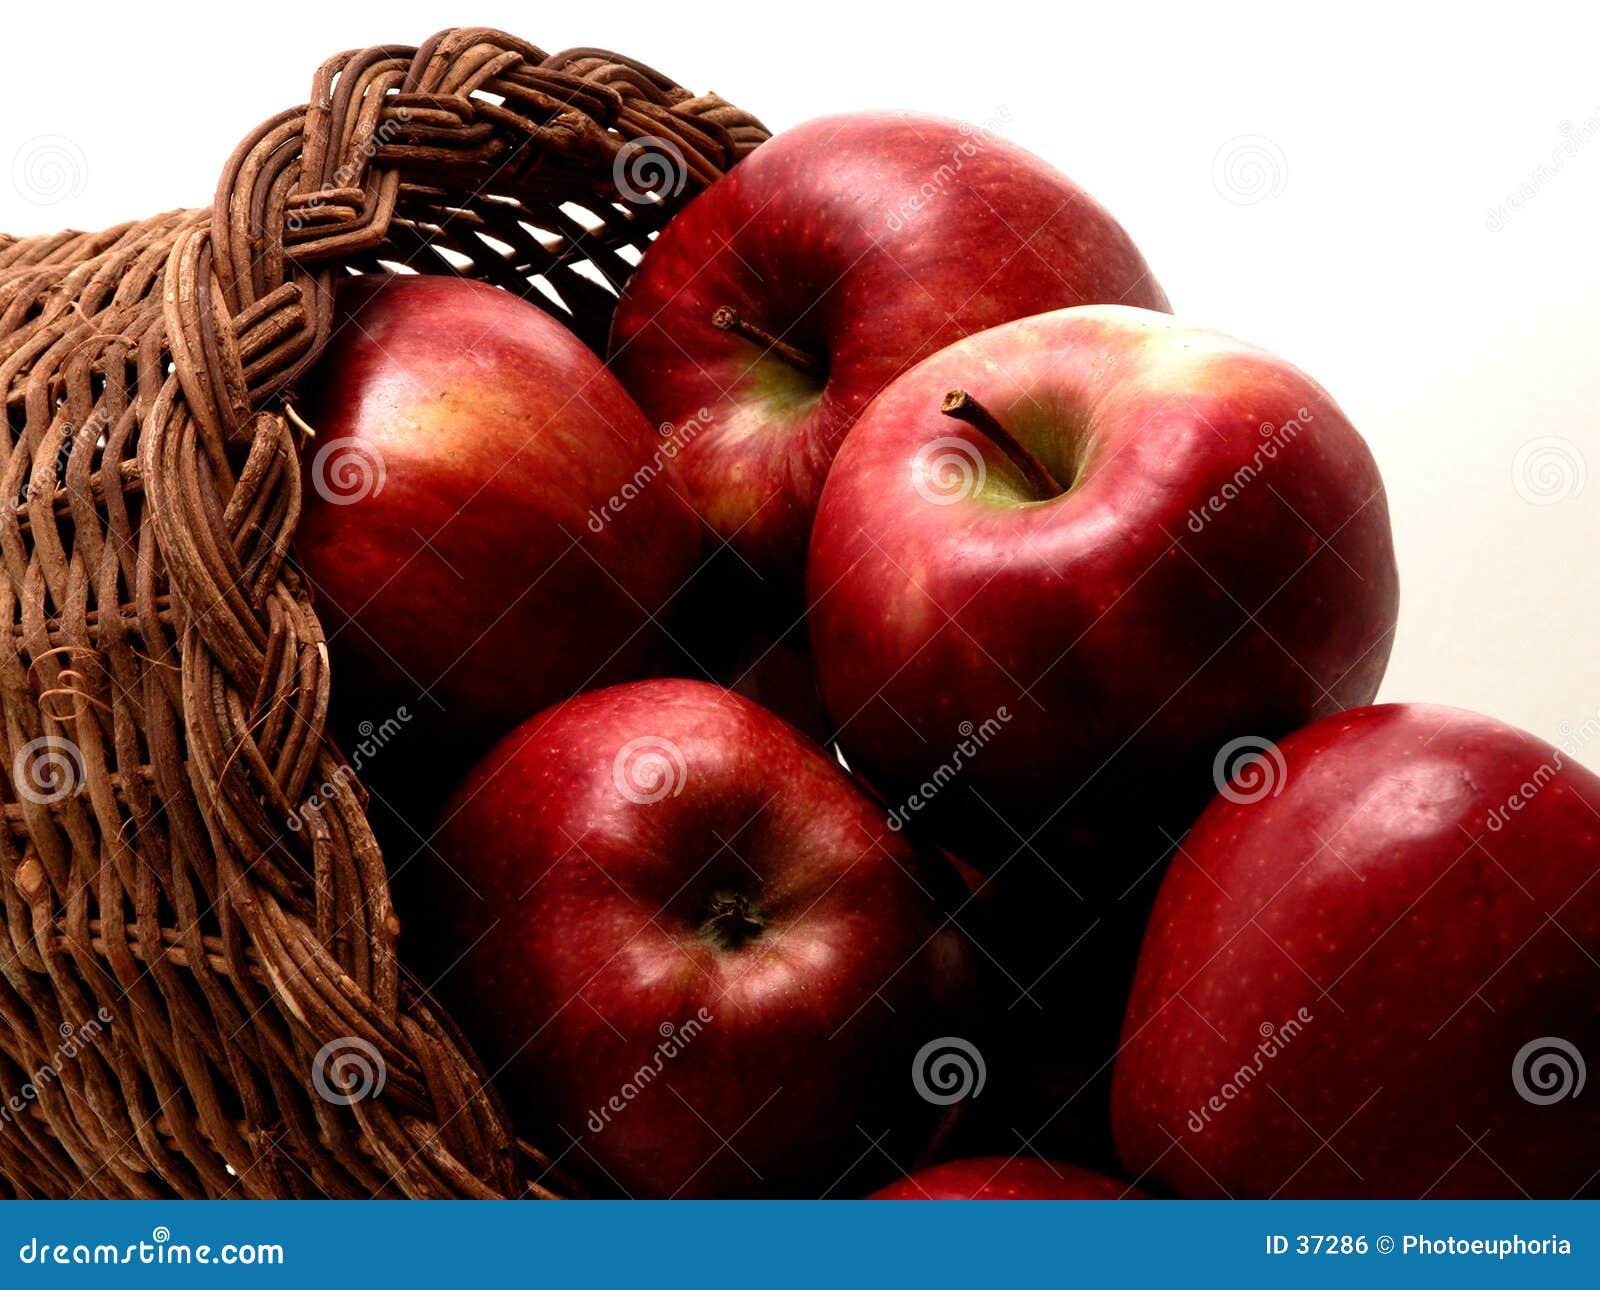 Food: Apple Basket (1 of 4)